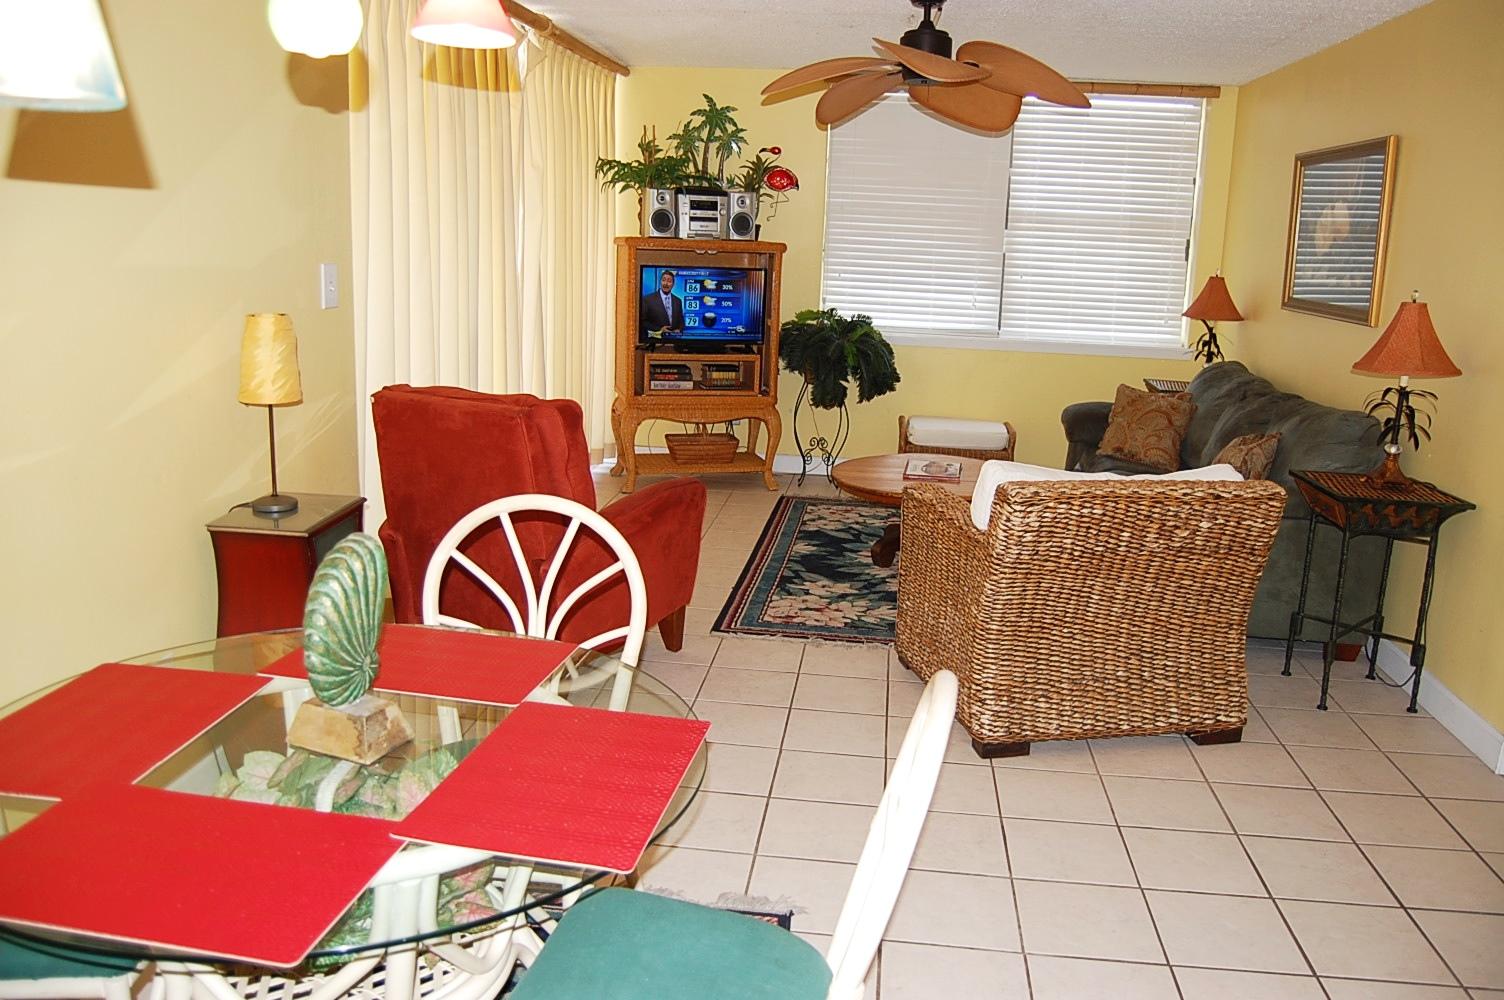 Gulf House 606 Condo rental in Gulf House Condominiums in Gulf Shores Alabama - #15